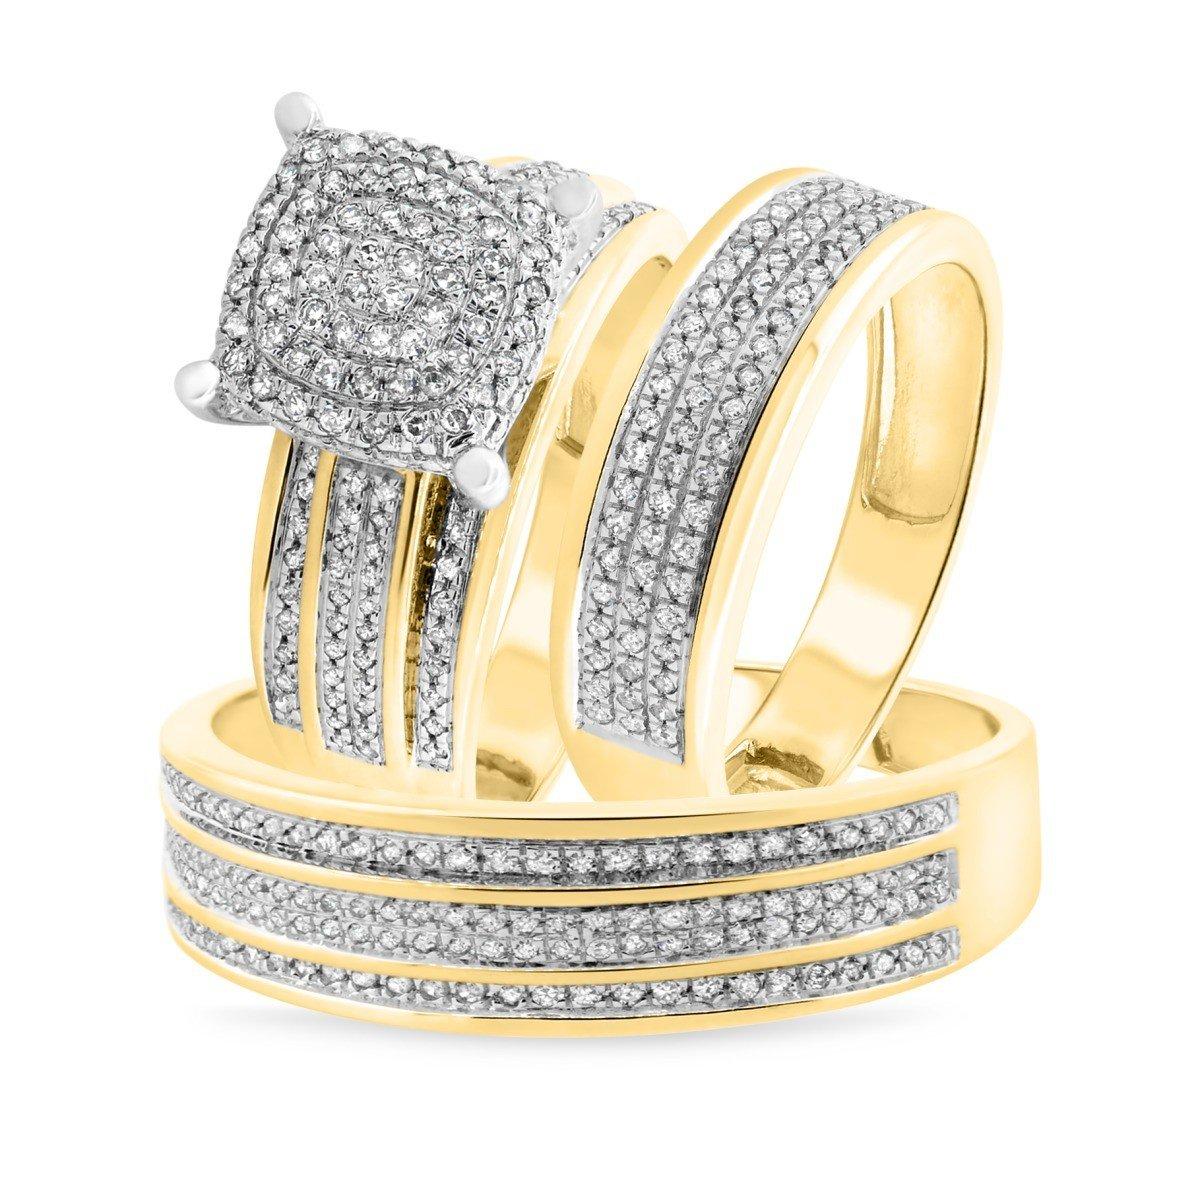 Silvercz Jewels 3/4 Carat T.W. Diamond Engagement Ring Wedding Trio Set In Solid 14K Yellow Gold Over